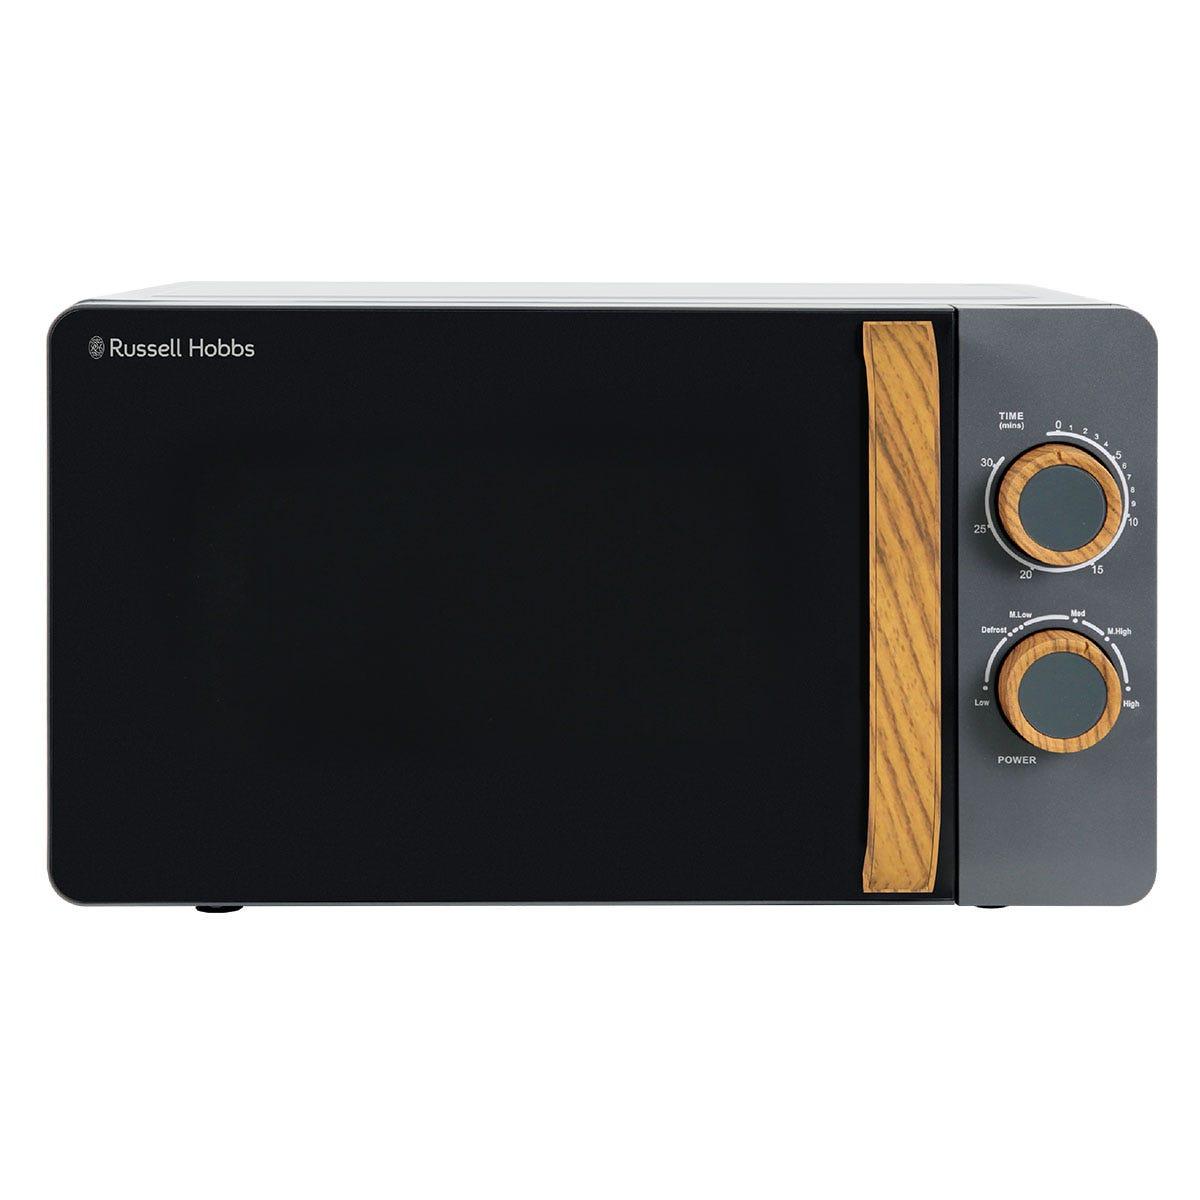 Russell Hobbs RHMM713G Scandi Compact 700W 17L Manual Microwave - Grey